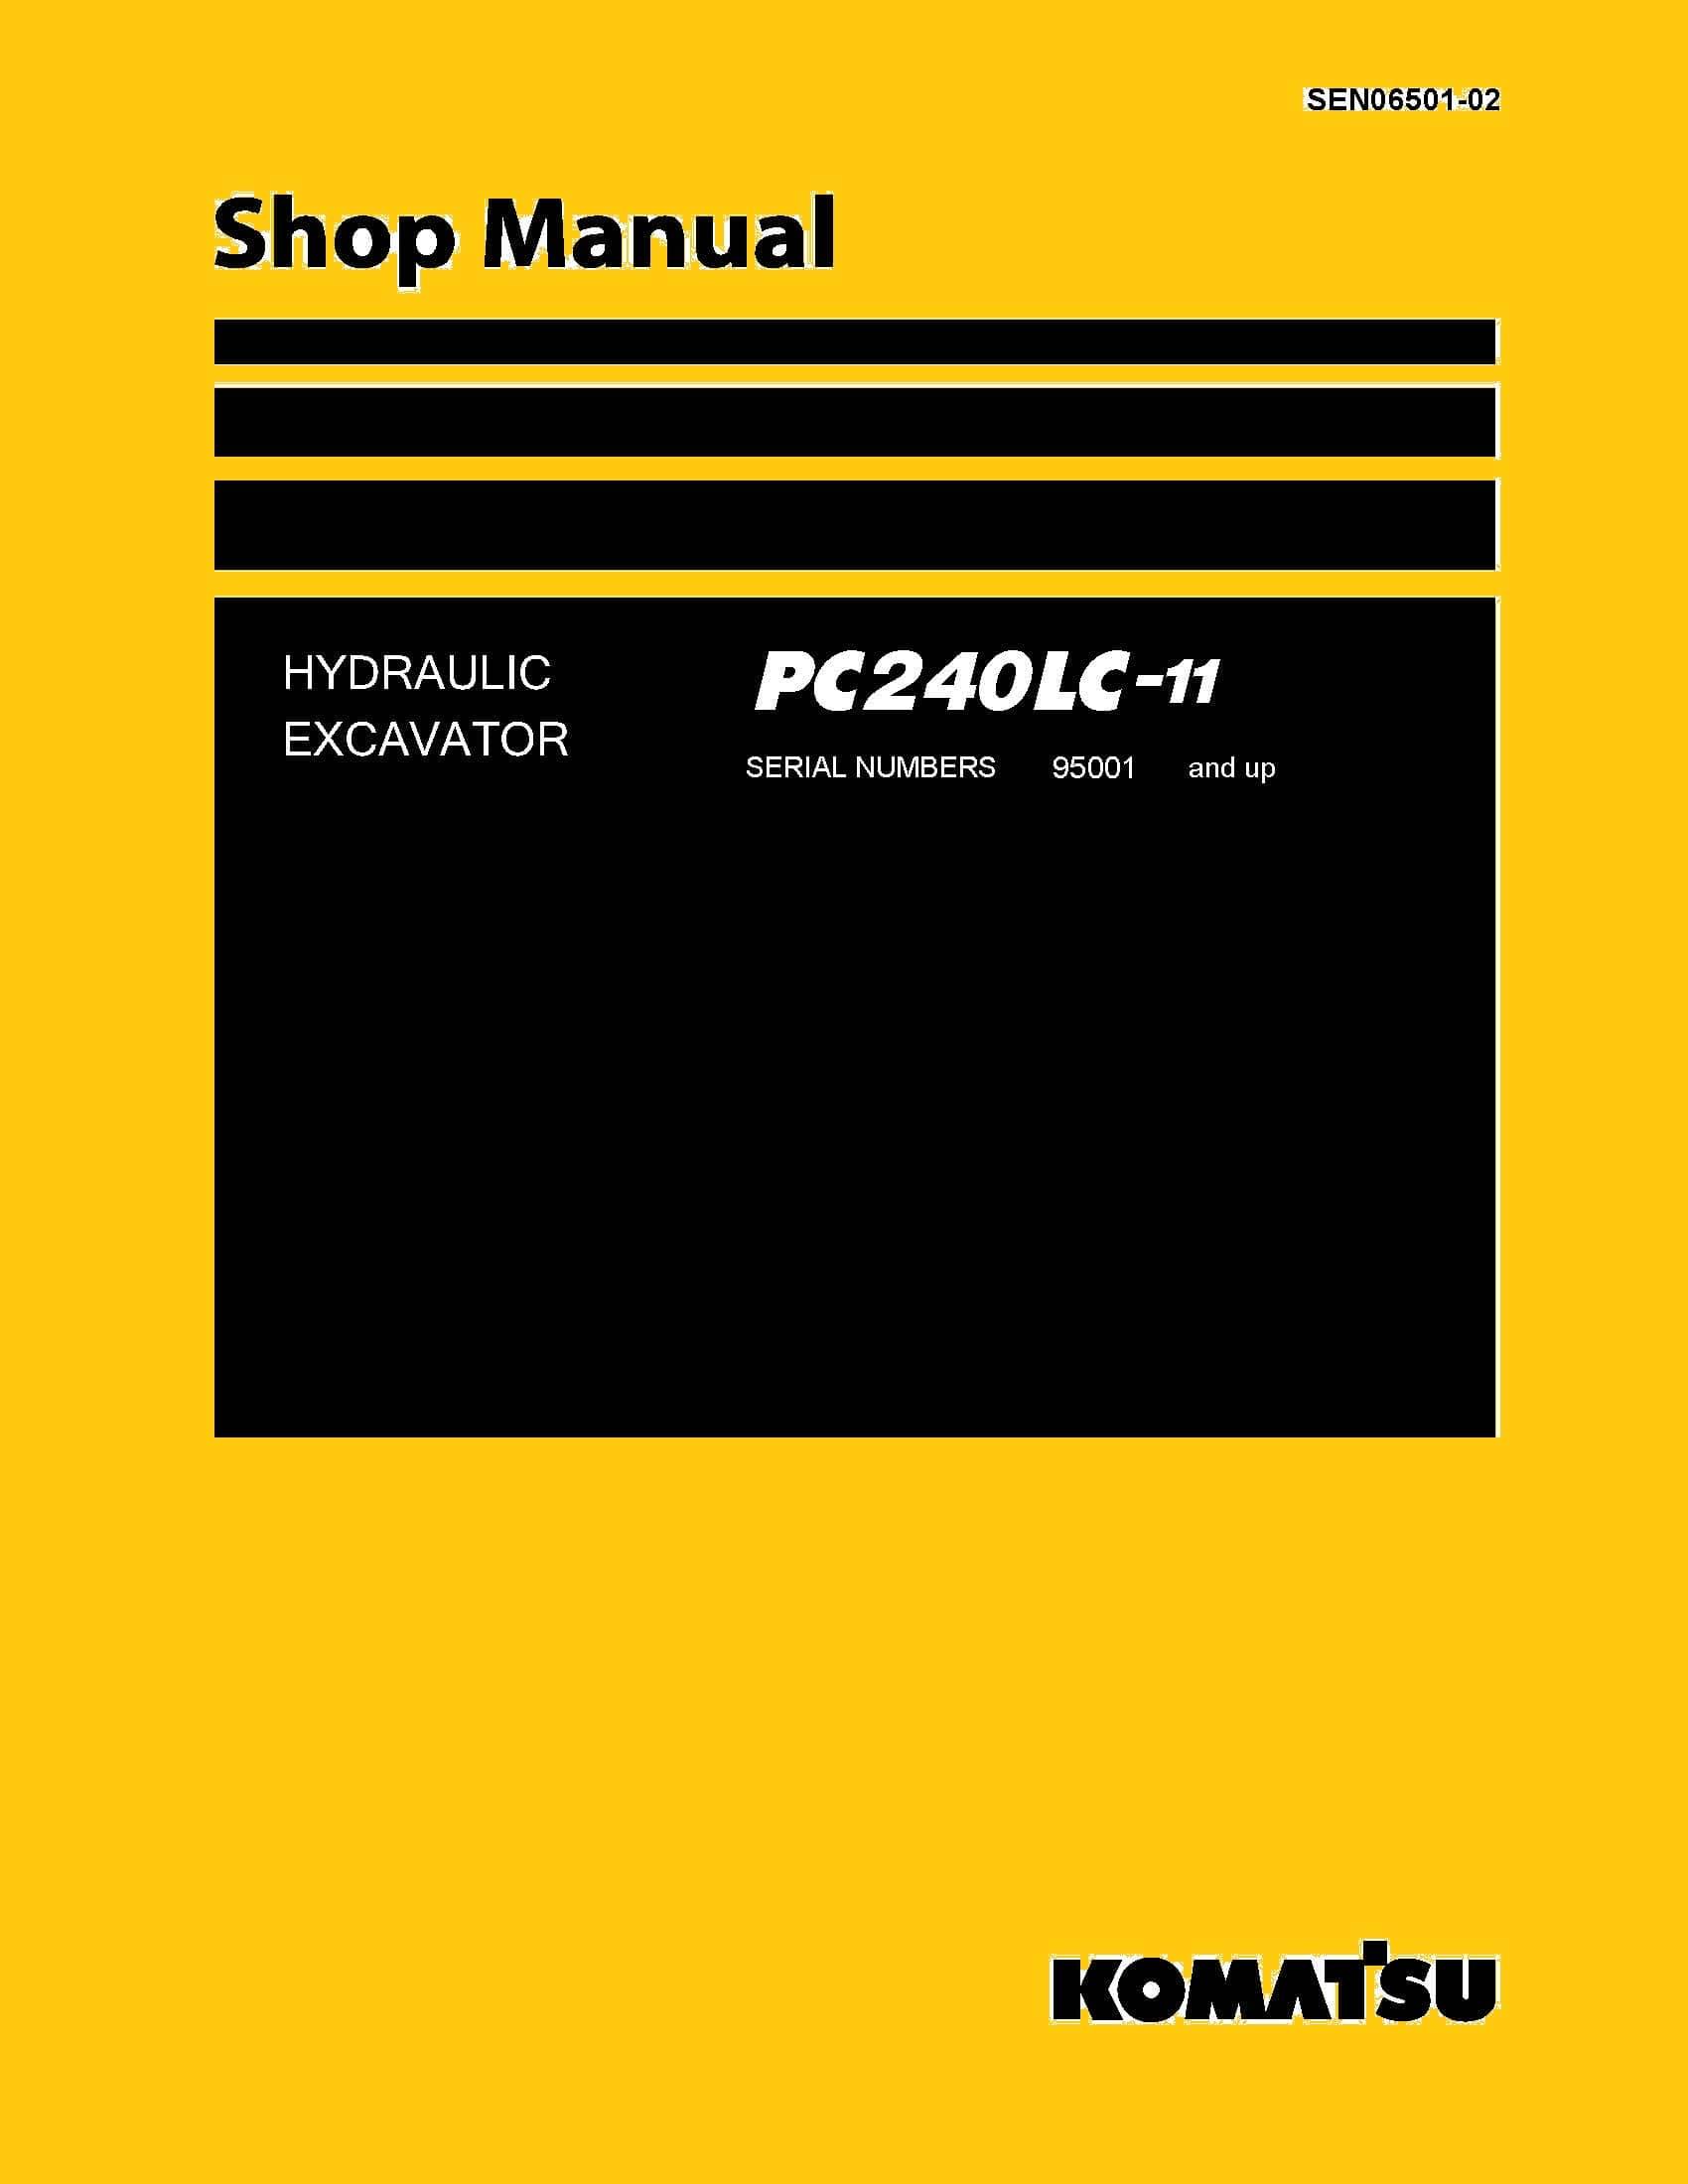 komatsu pc240lc 11 hydraulic excavator workshop repair. Black Bedroom Furniture Sets. Home Design Ideas